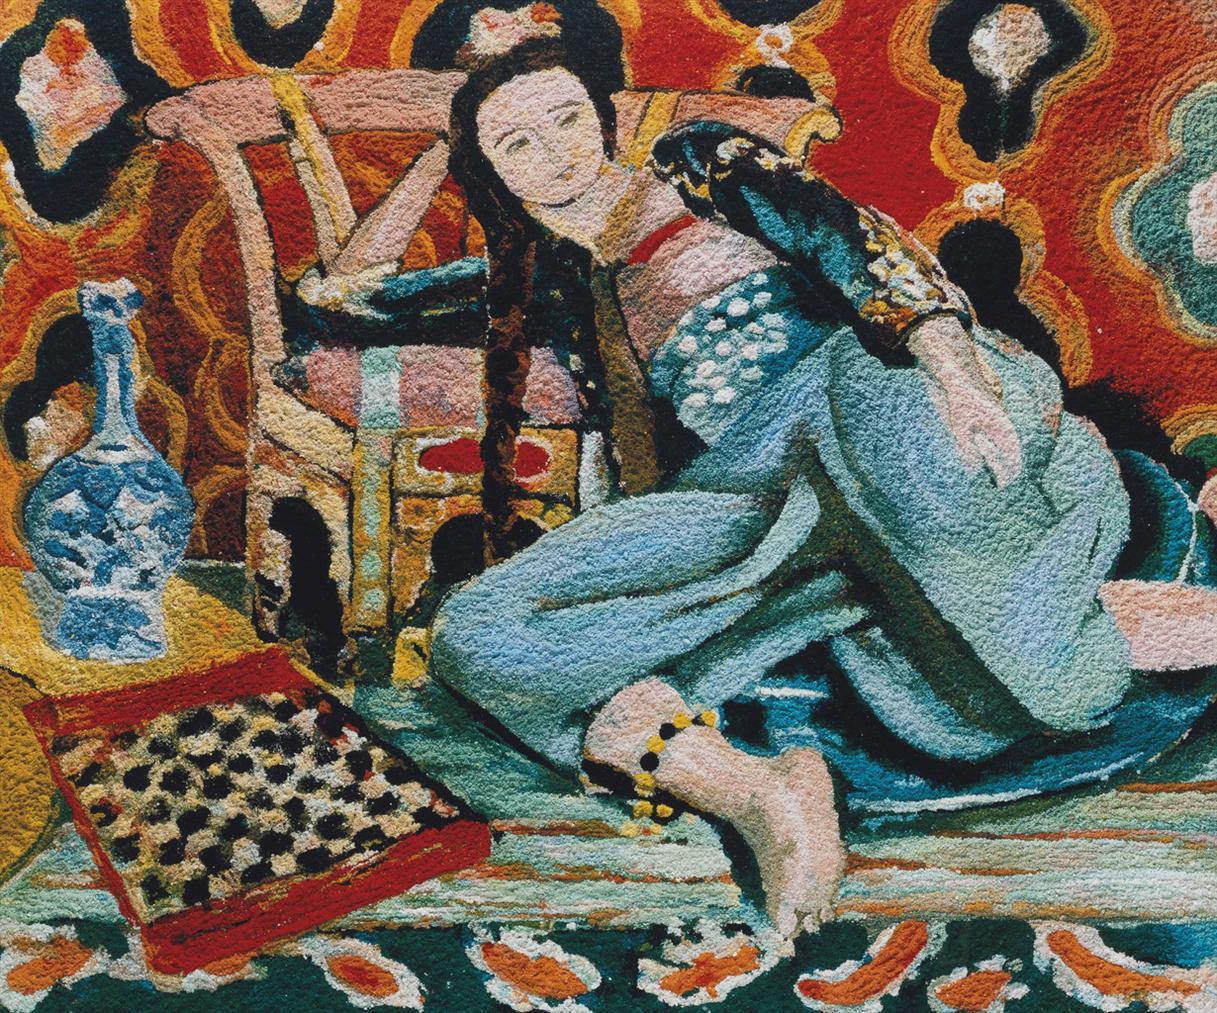 Vik Muniz-Odalisque With A Turkish Chair, After Matisse-2006